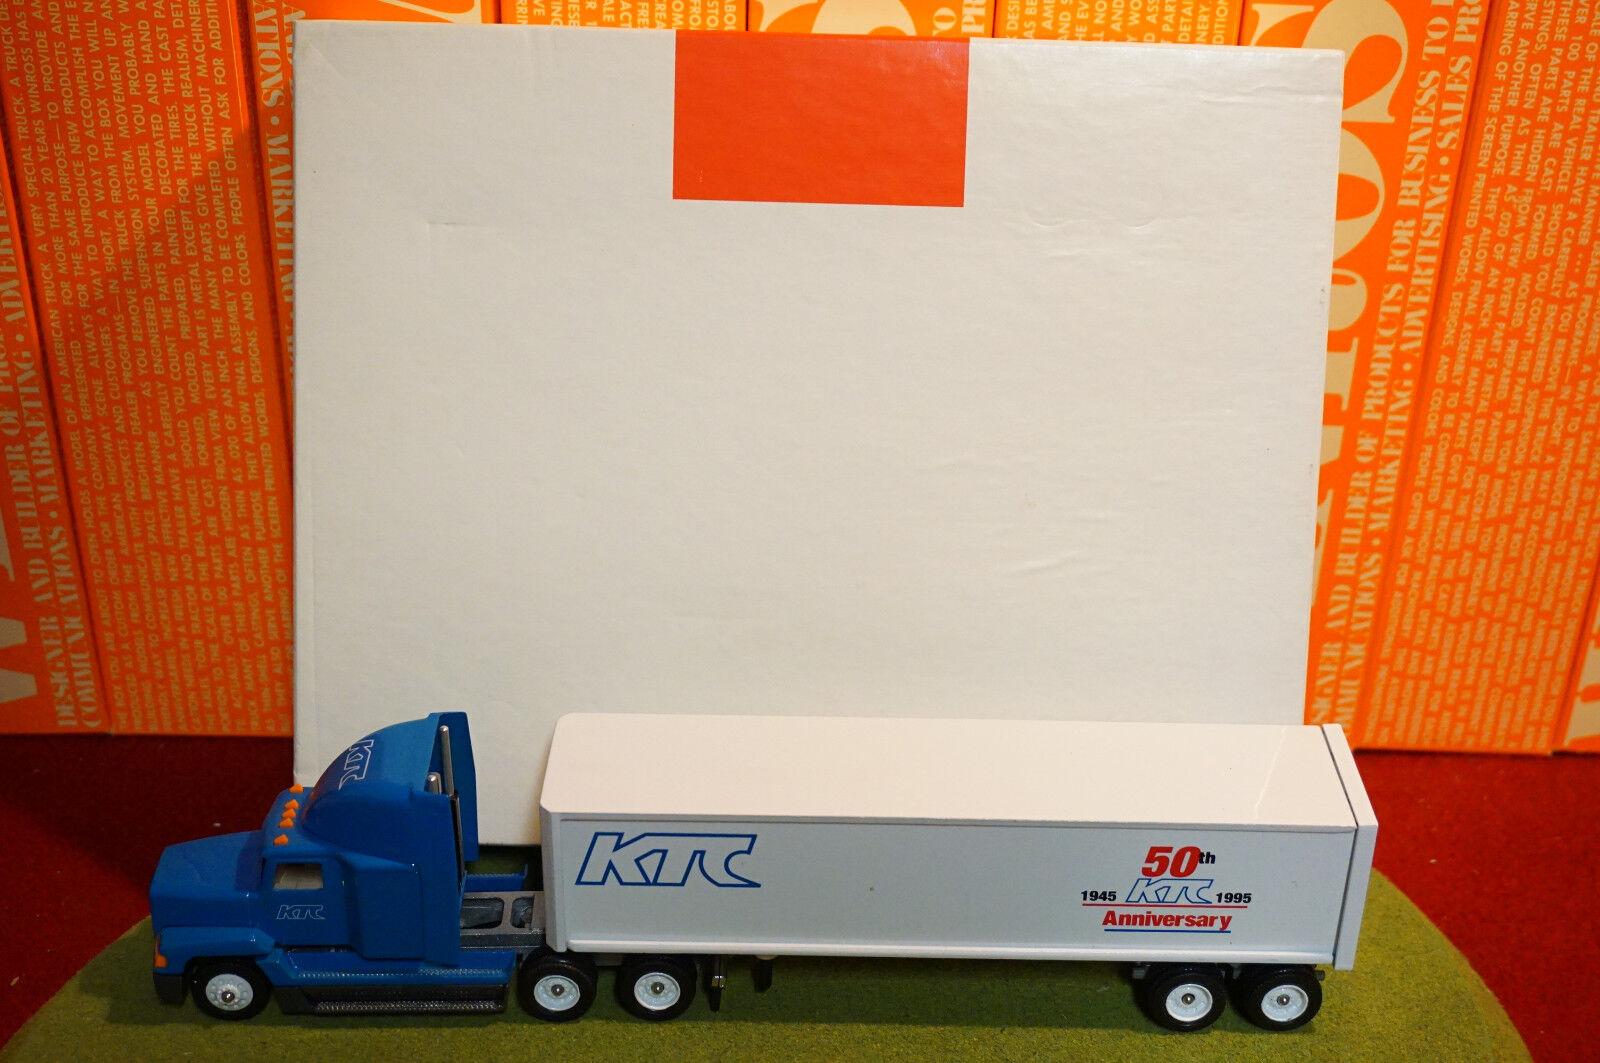 Winross Diecast 1/64 Scale Truck Kuhn Transportation (KTC) Cargo 1997